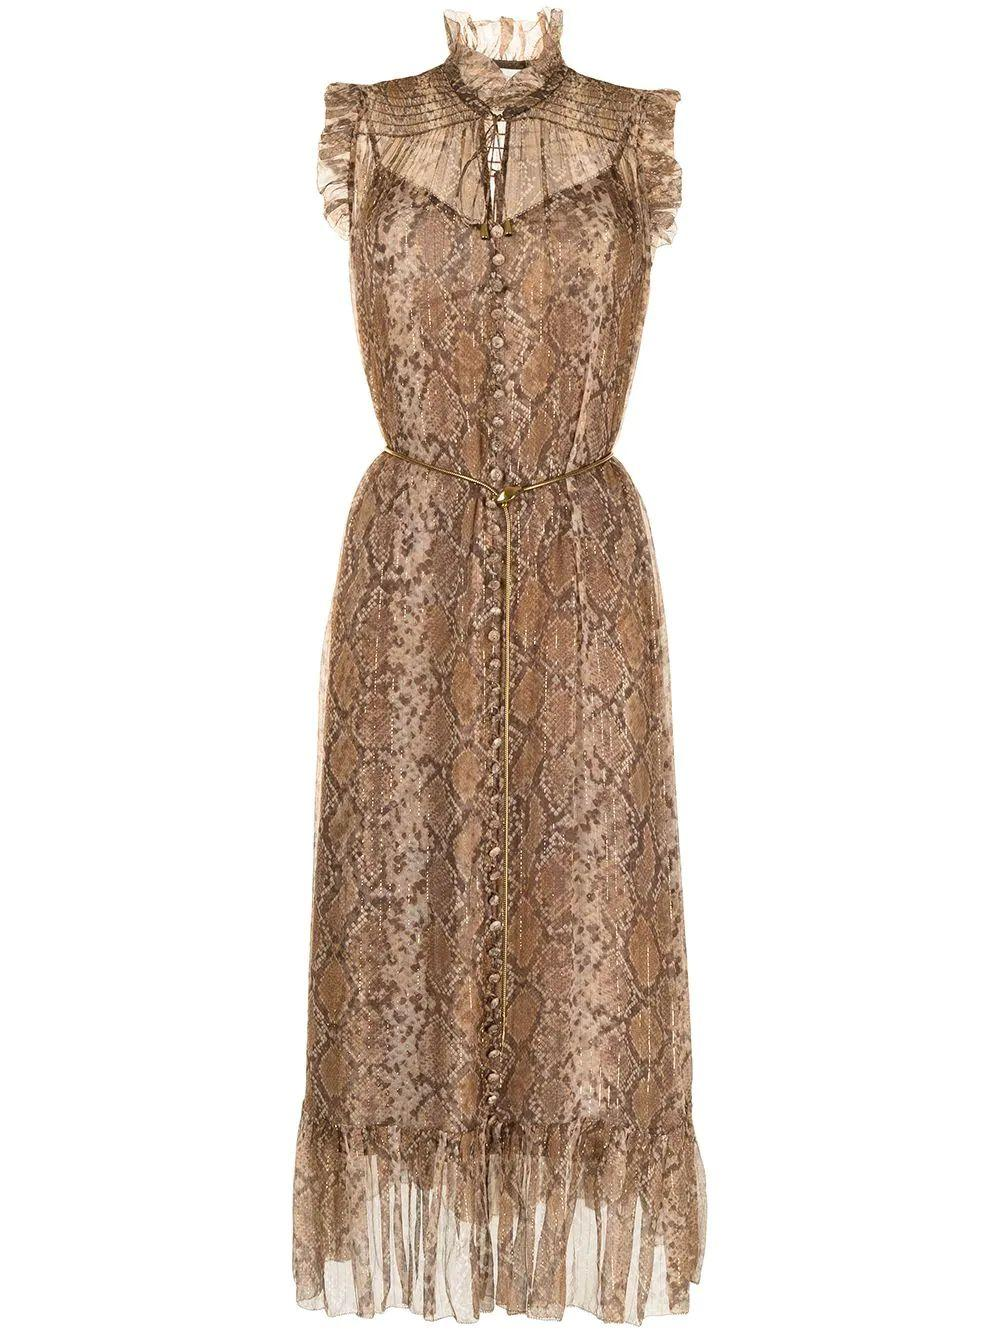 Botanica Python Swing Midi Dress